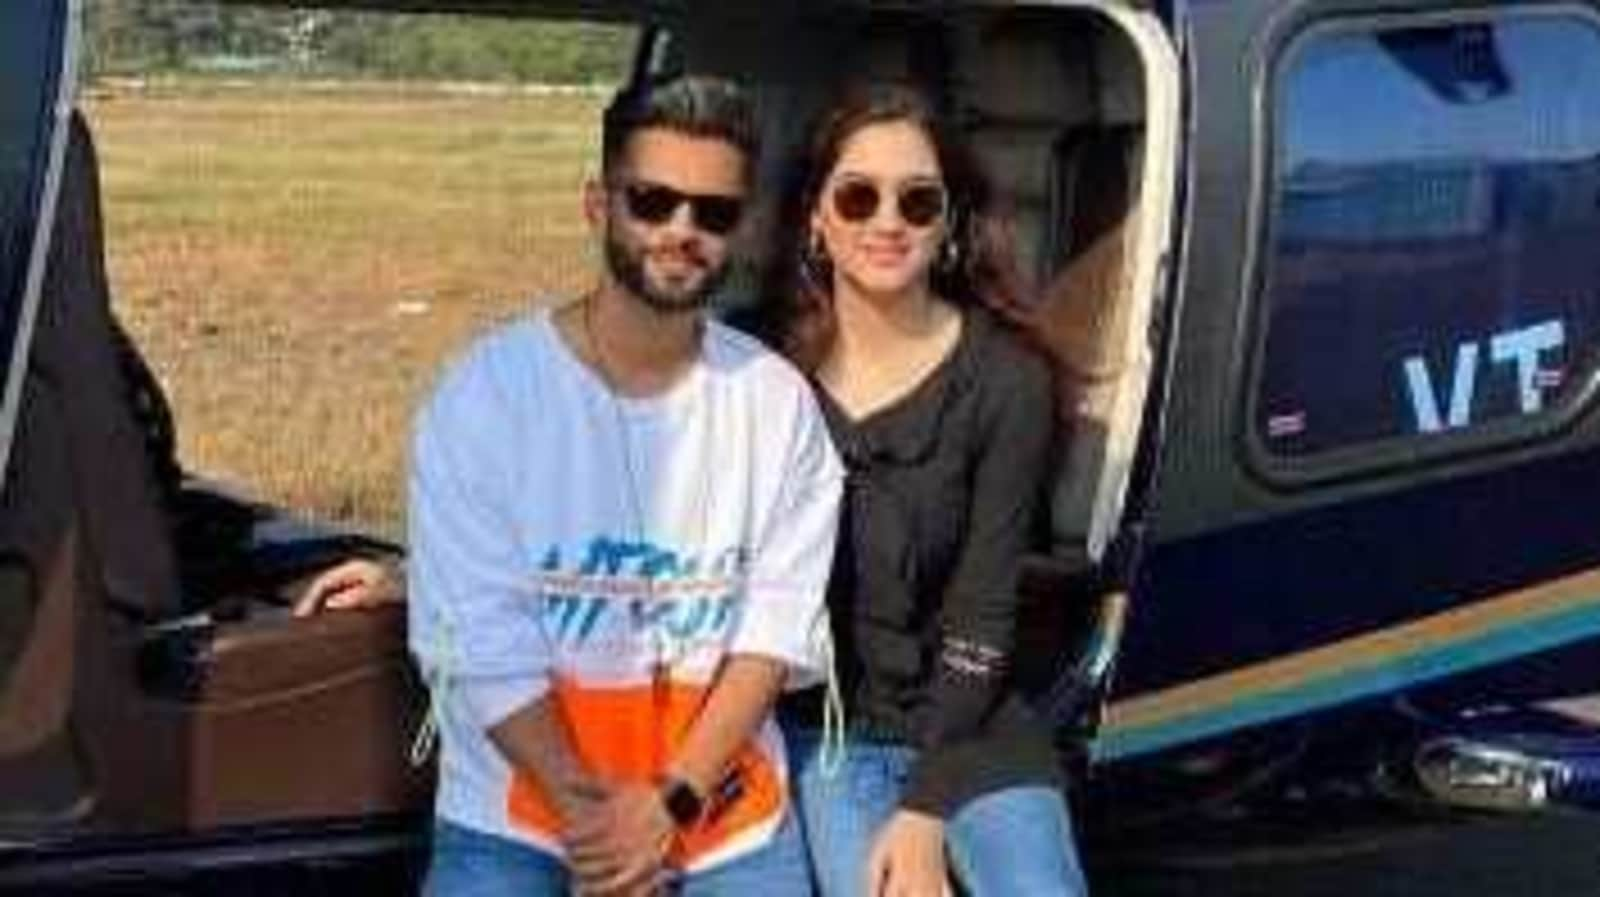 Bigg Boss 14 runner-up Rahul Vaidya takes girlfriend Disha Parmar on a helicopter ride, see here - Hindustan Times